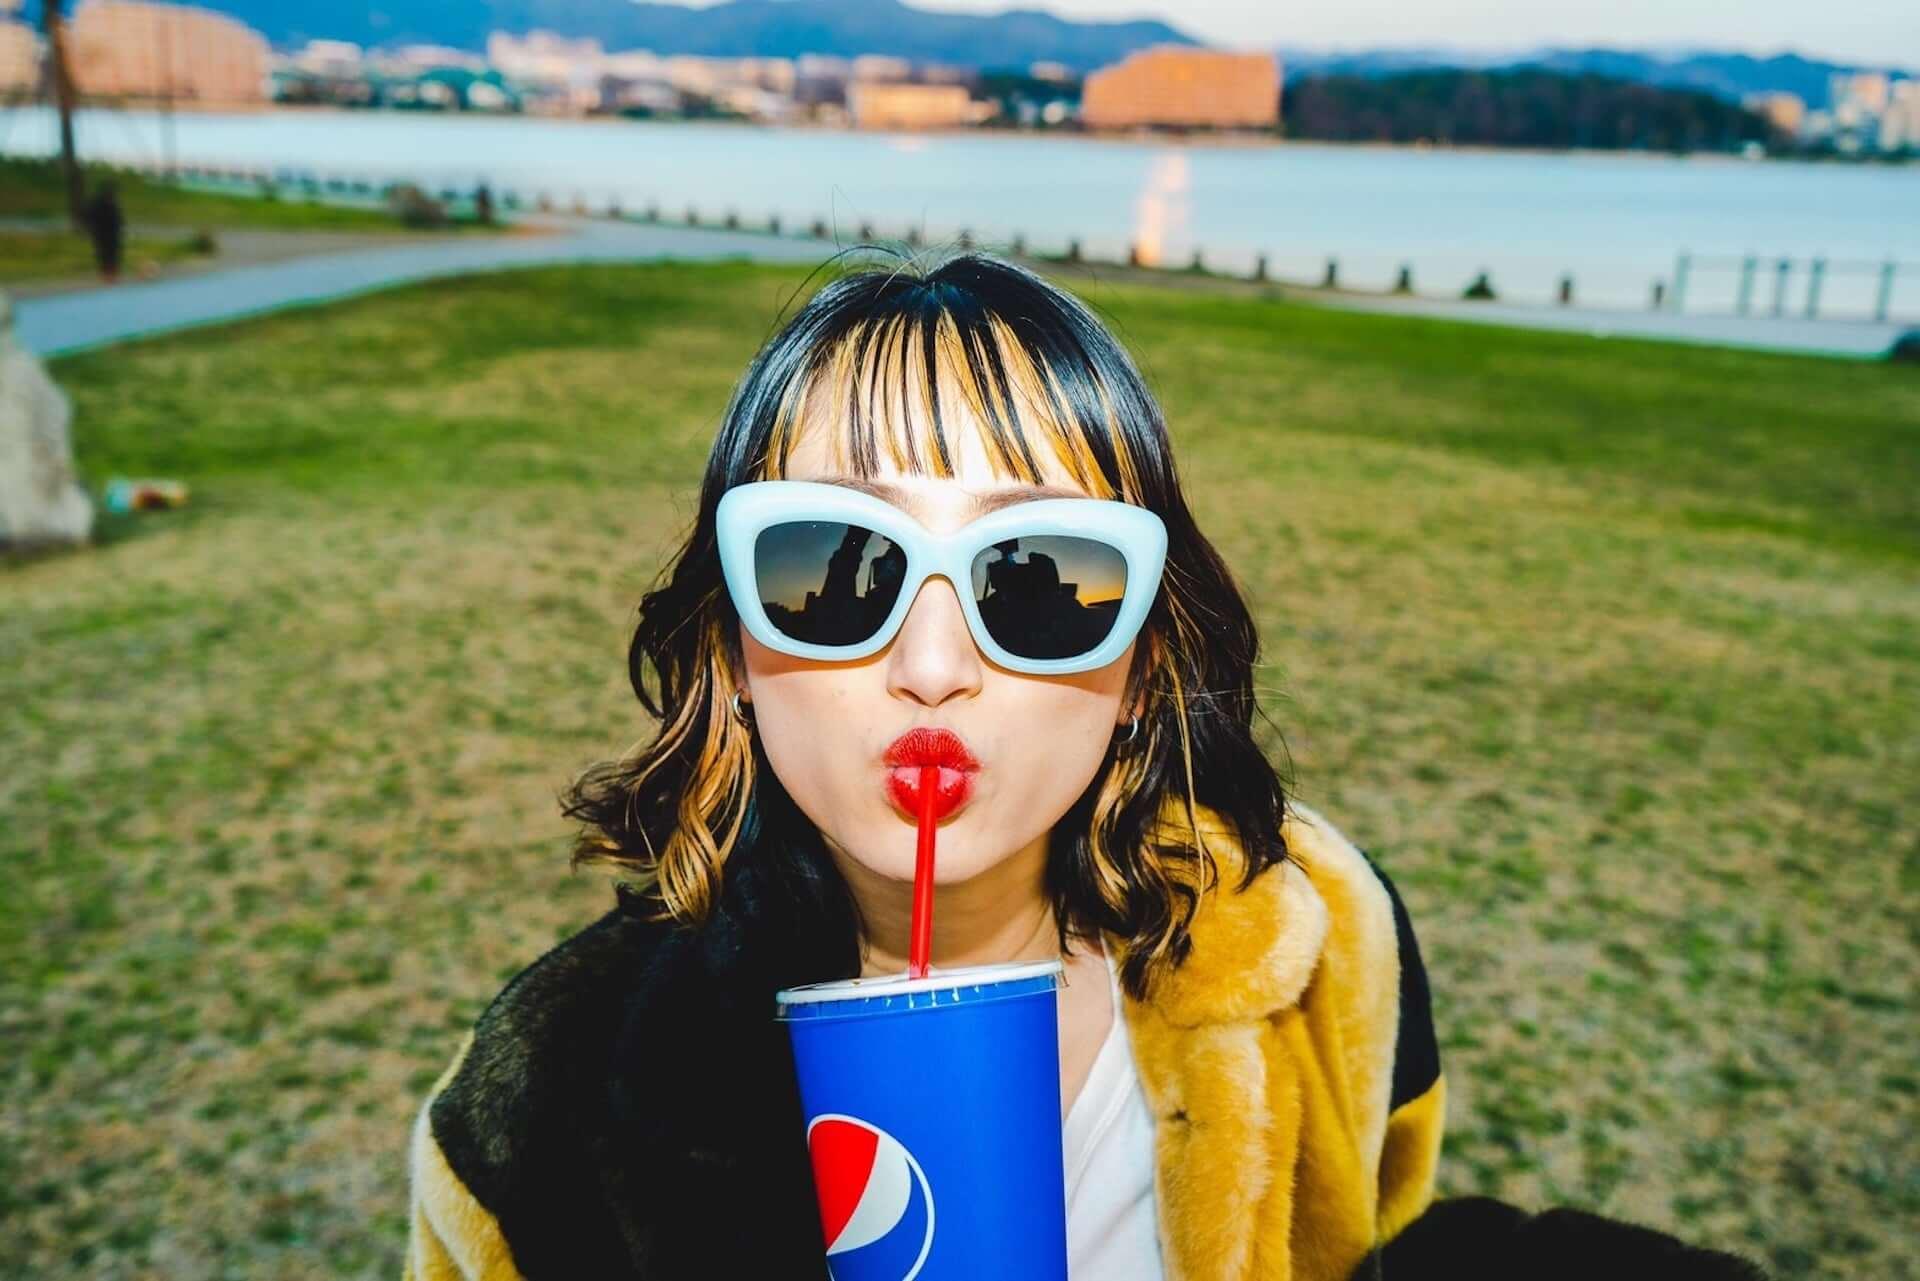 "Calli Stephusが週末CITY PLAY BOYZ・BUGSプロデュースの新EP『FRIENDS』をリリース!収録曲""SHE""のMVも公開 music200721_calli-stephus_2-1920x1281"